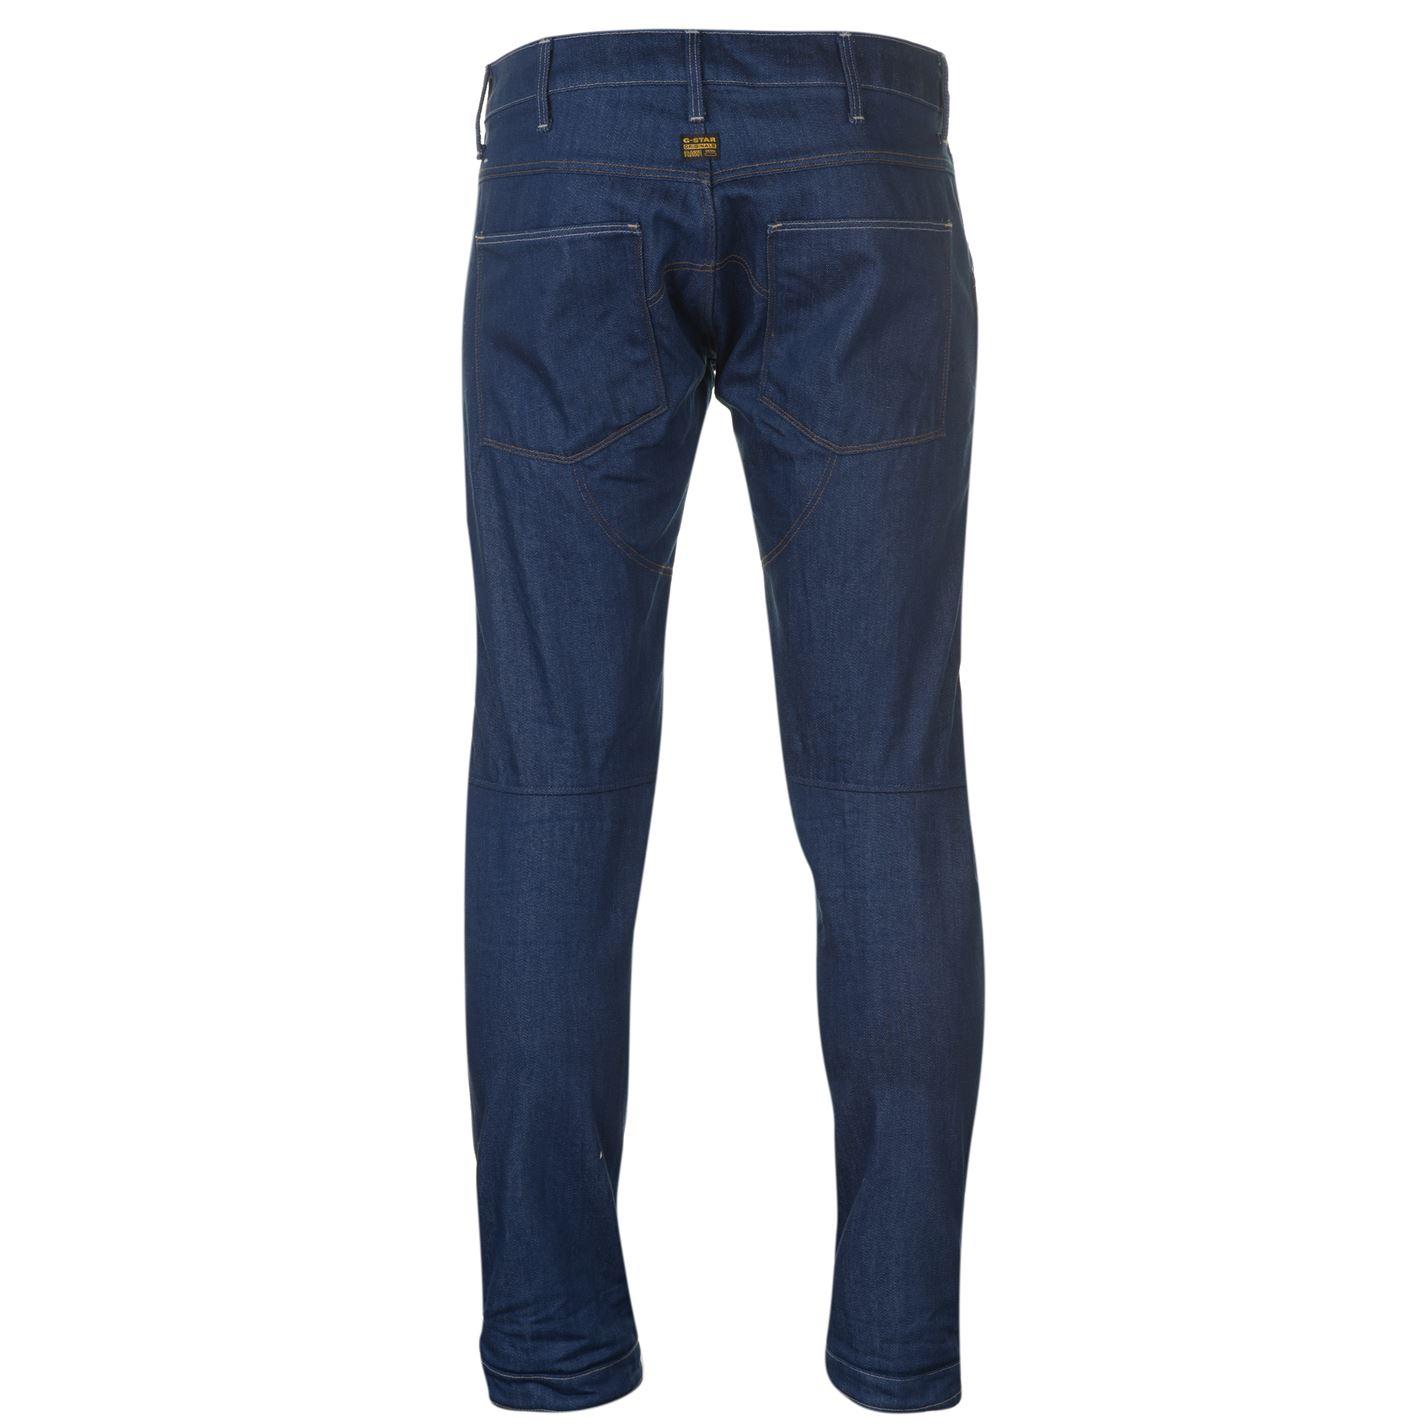 g star mens 5620 3d low tapered jeans straight pants. Black Bedroom Furniture Sets. Home Design Ideas